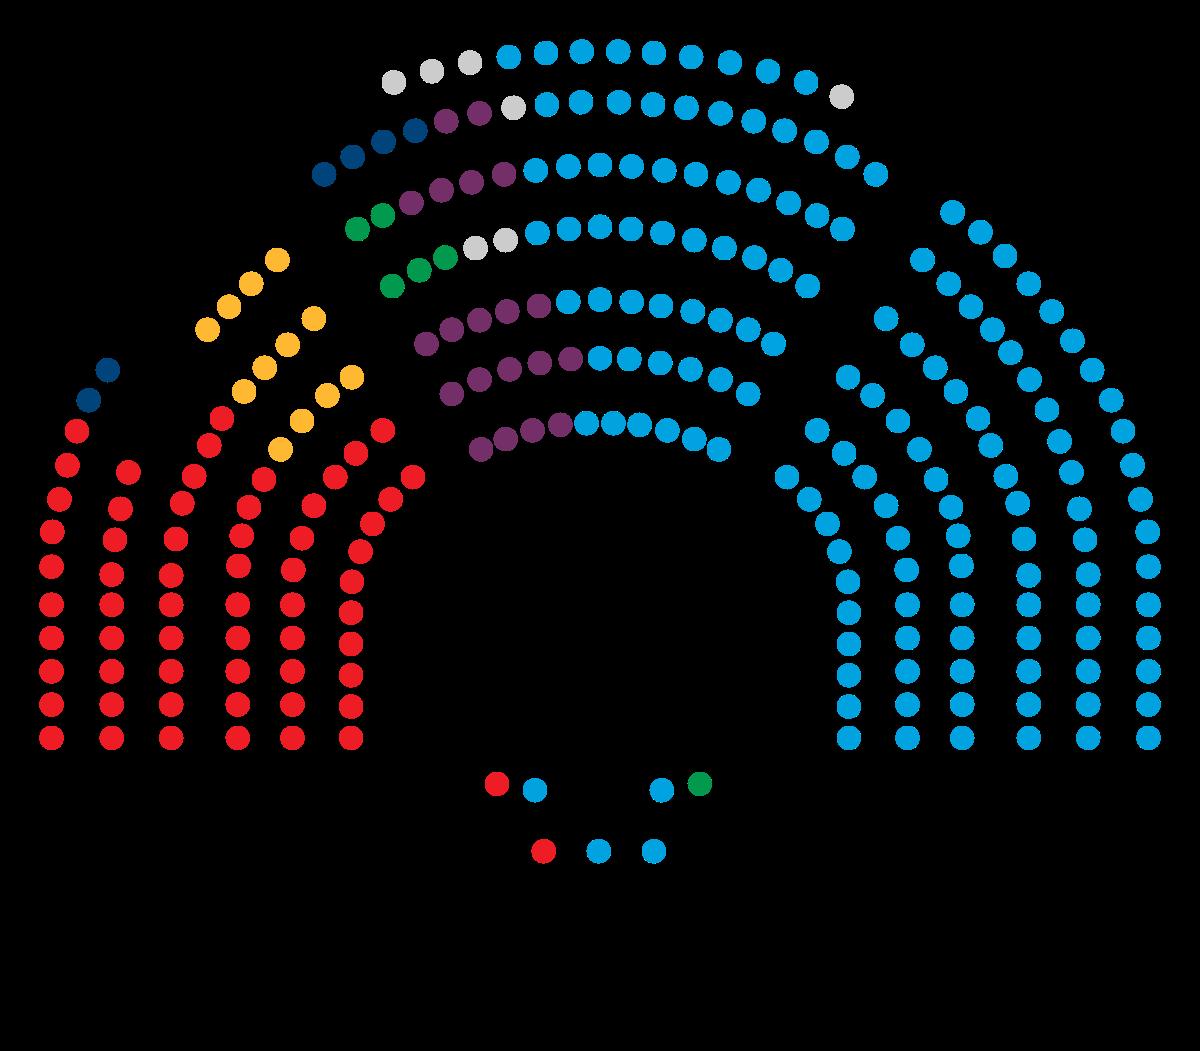 Senate of spain wikipedia. Politics clipart party caucus